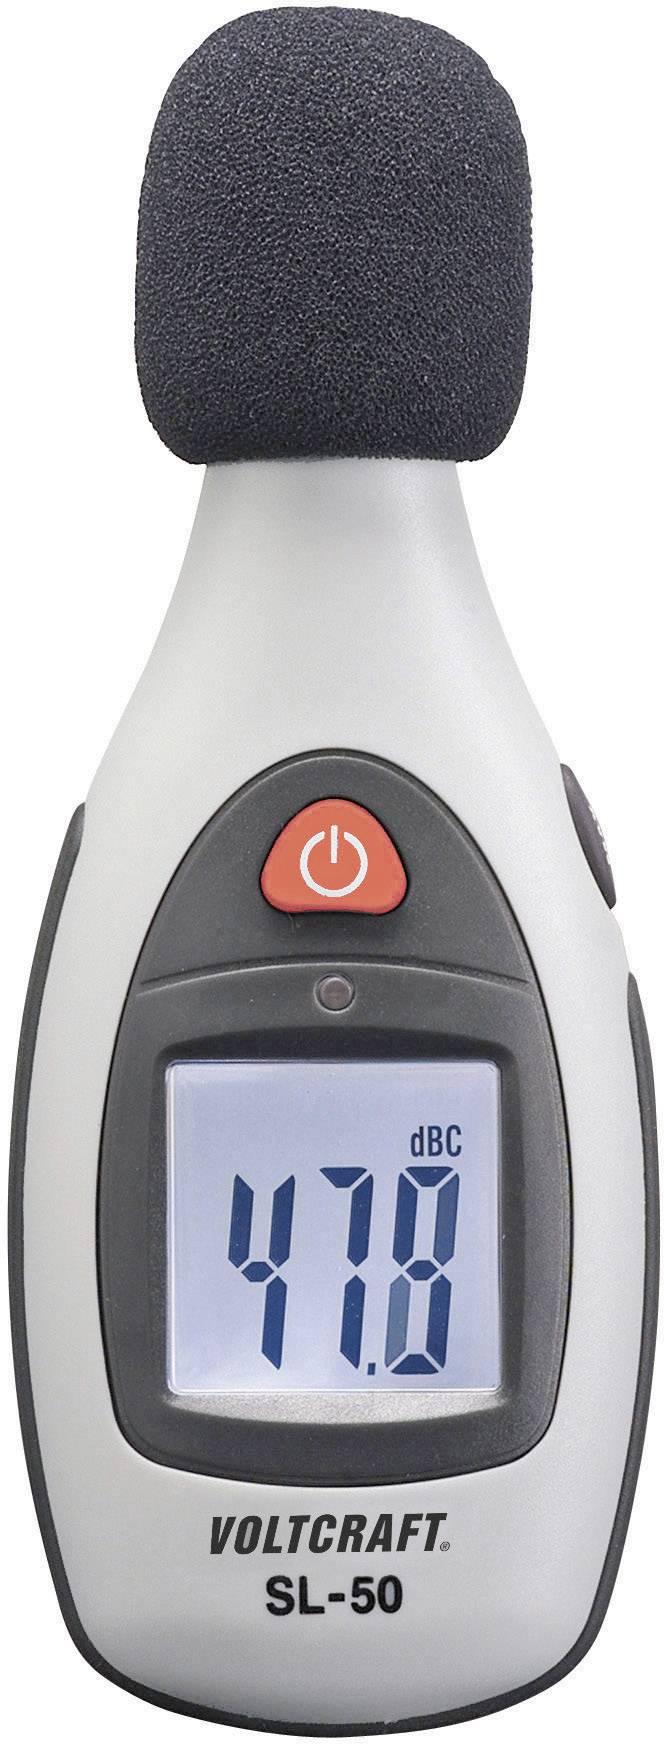 Digitálny hlukomer Voltcraft SL-50, 40 až 130 DBC